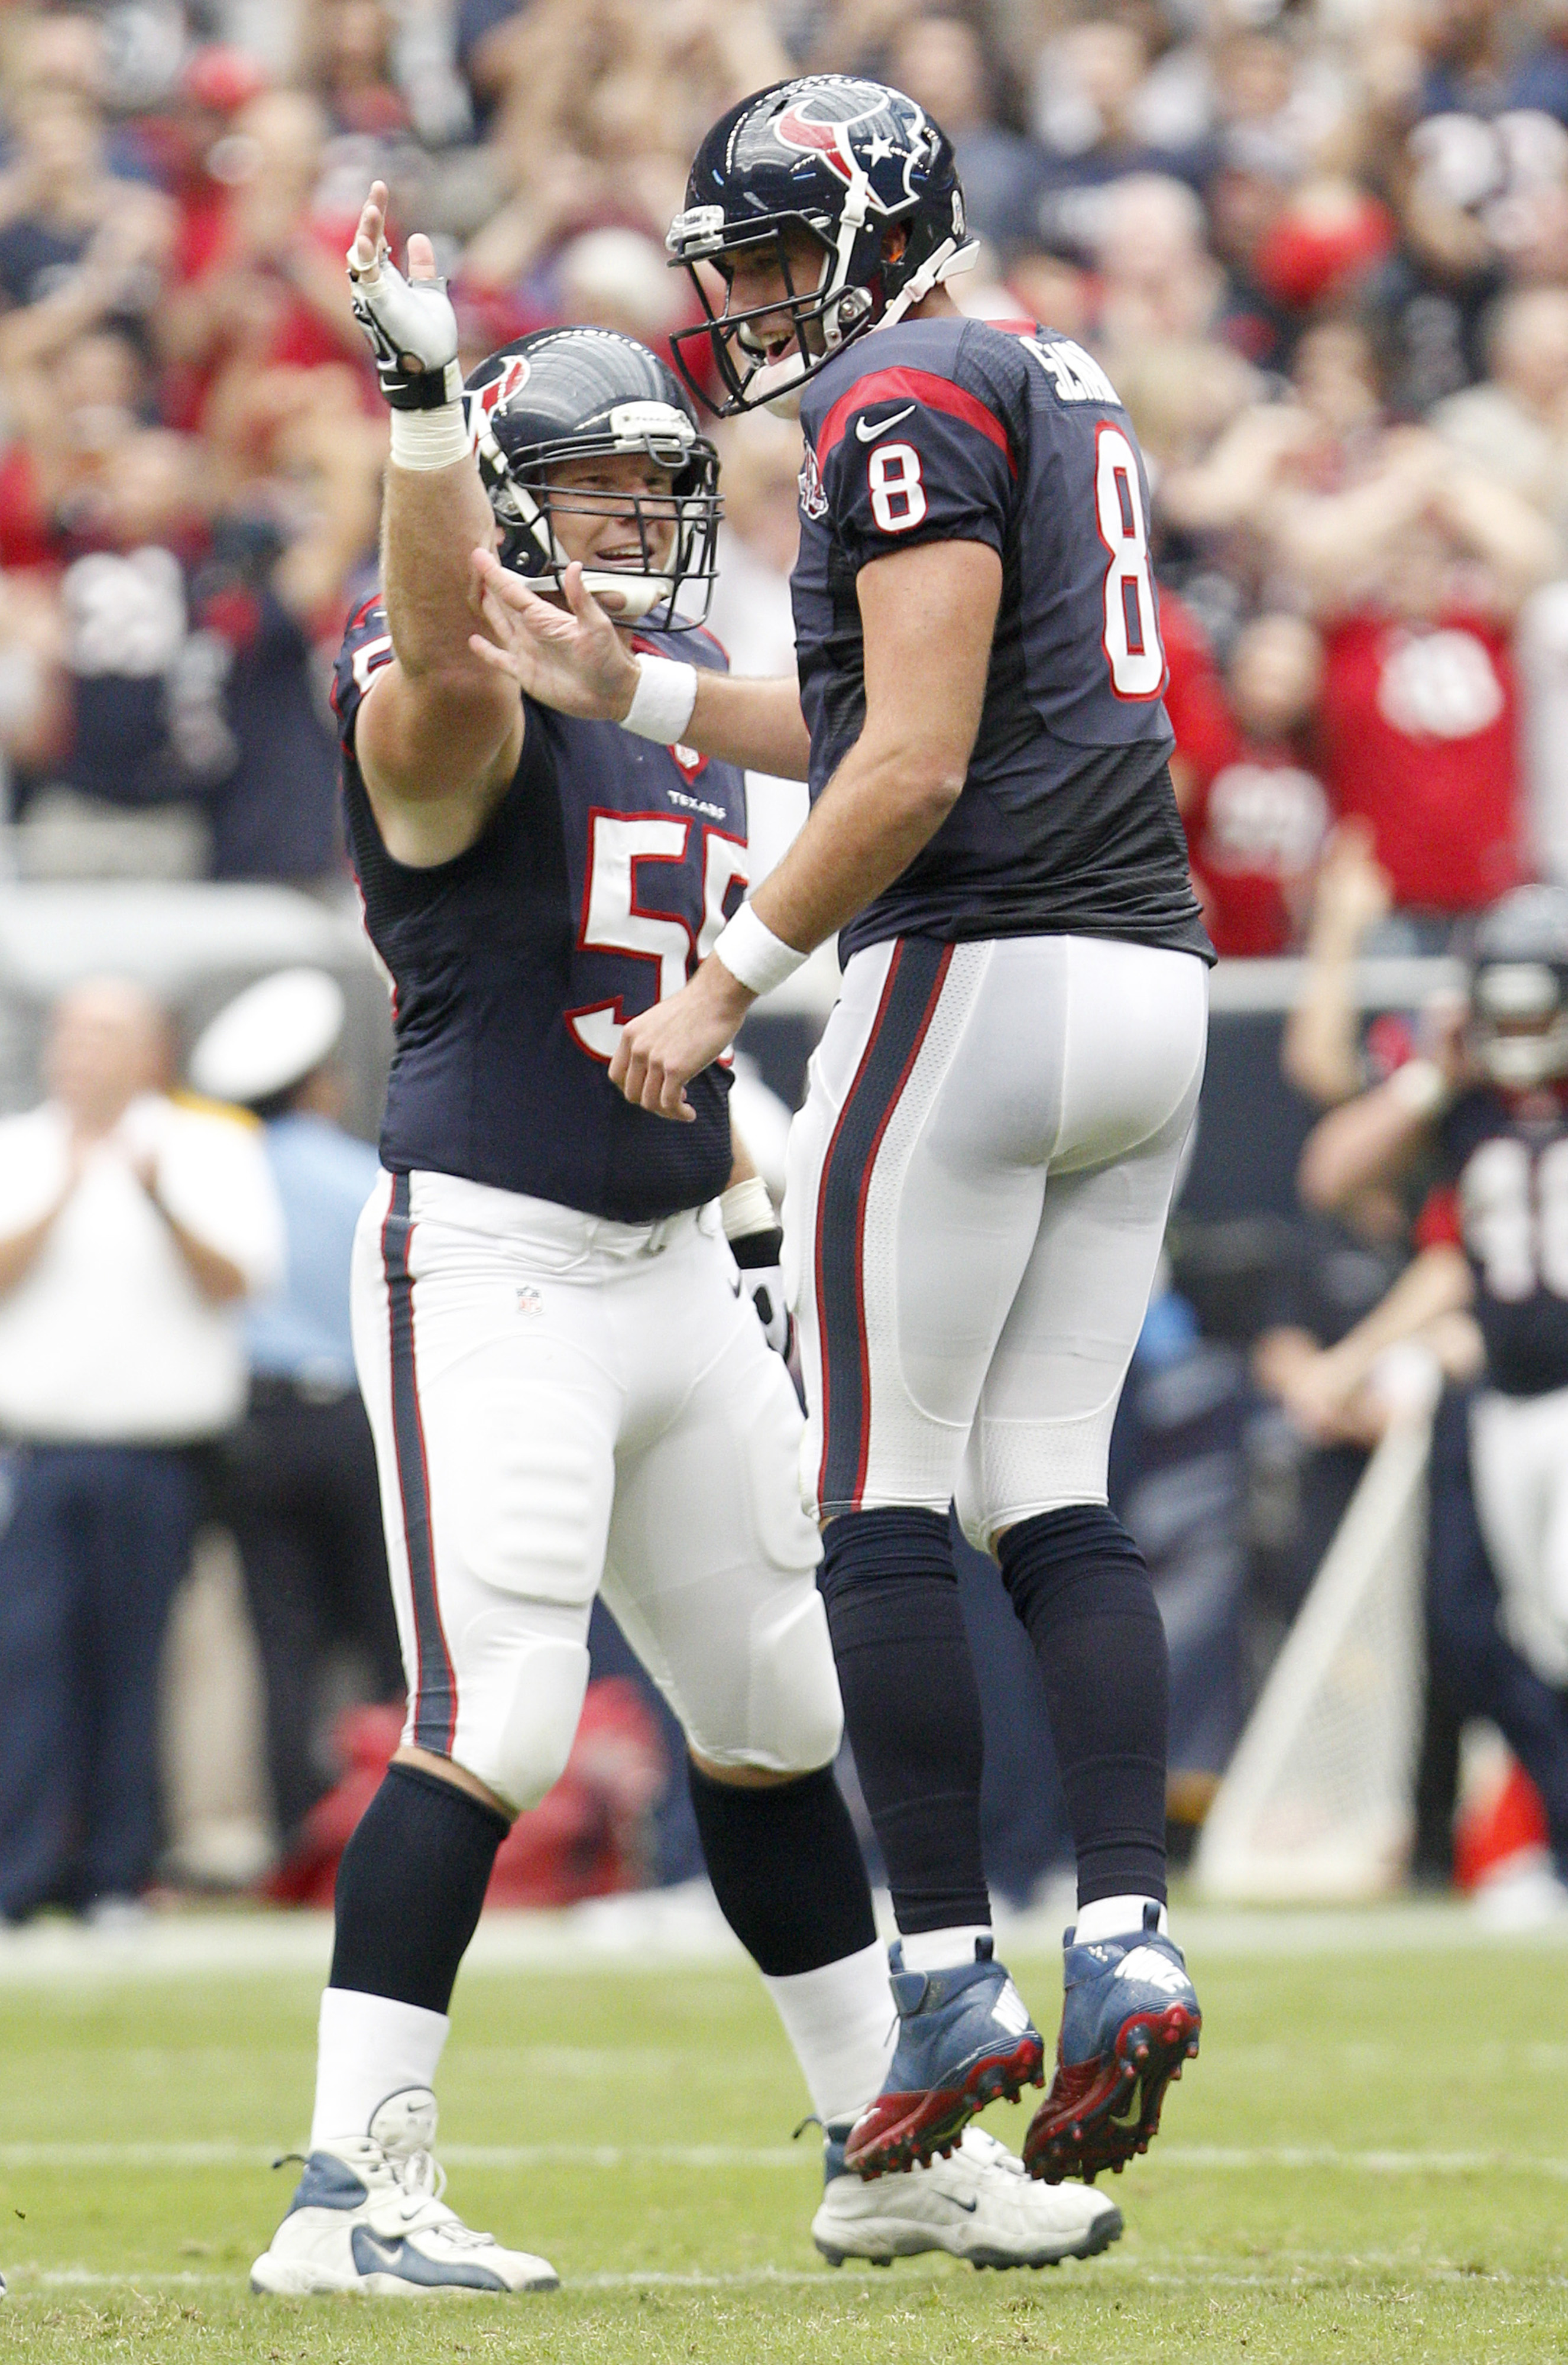 Matt Schaub is happy to quarterback the 7-1 Texans.